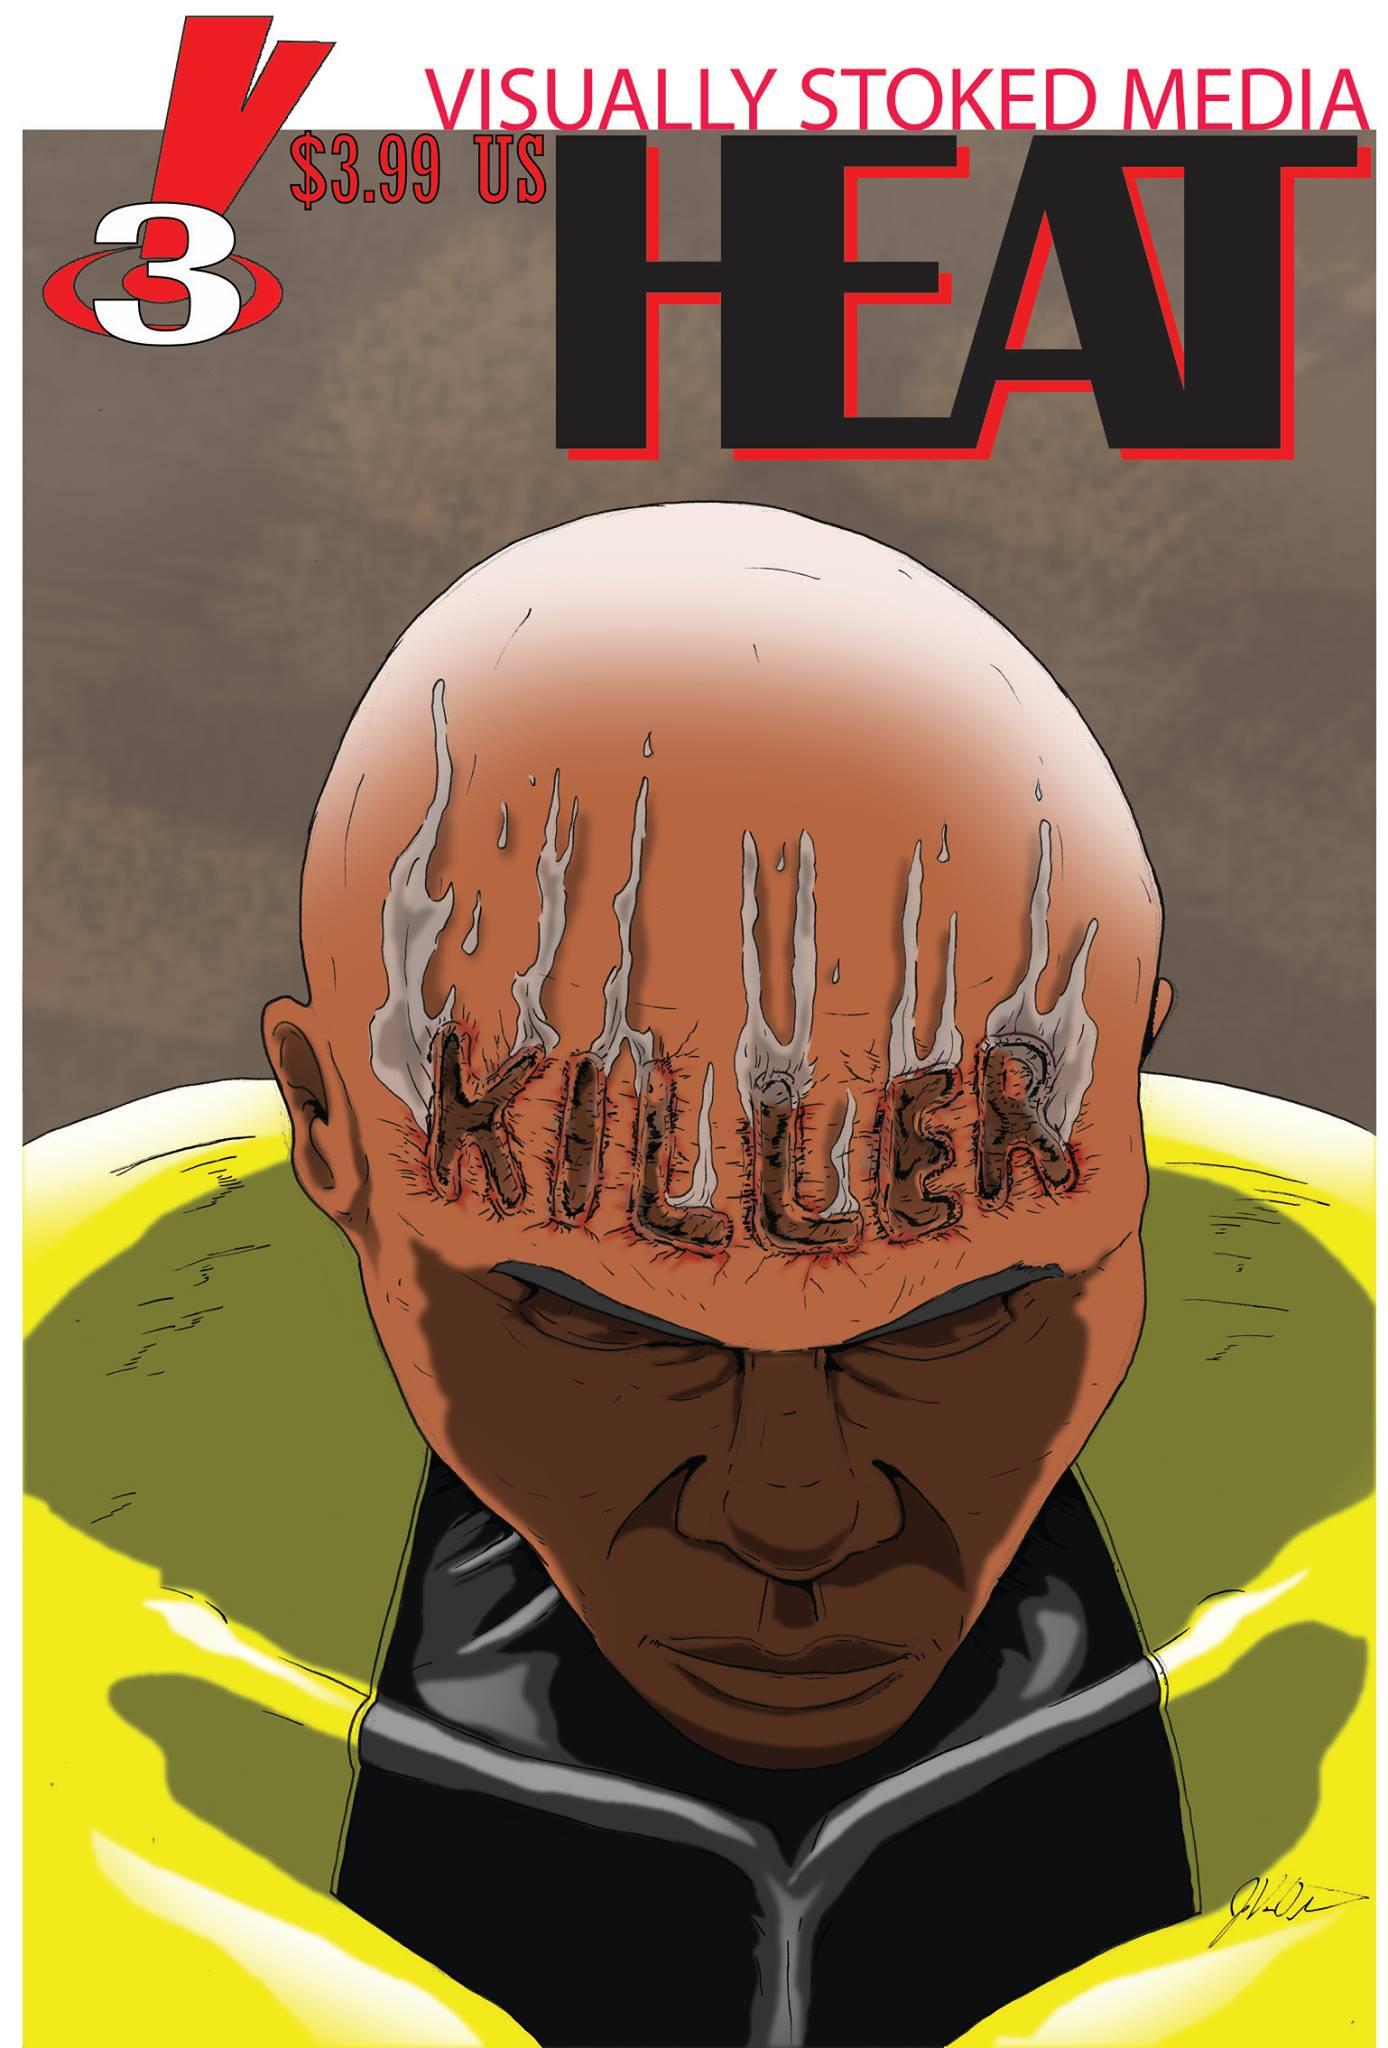 Heat black teen superhero